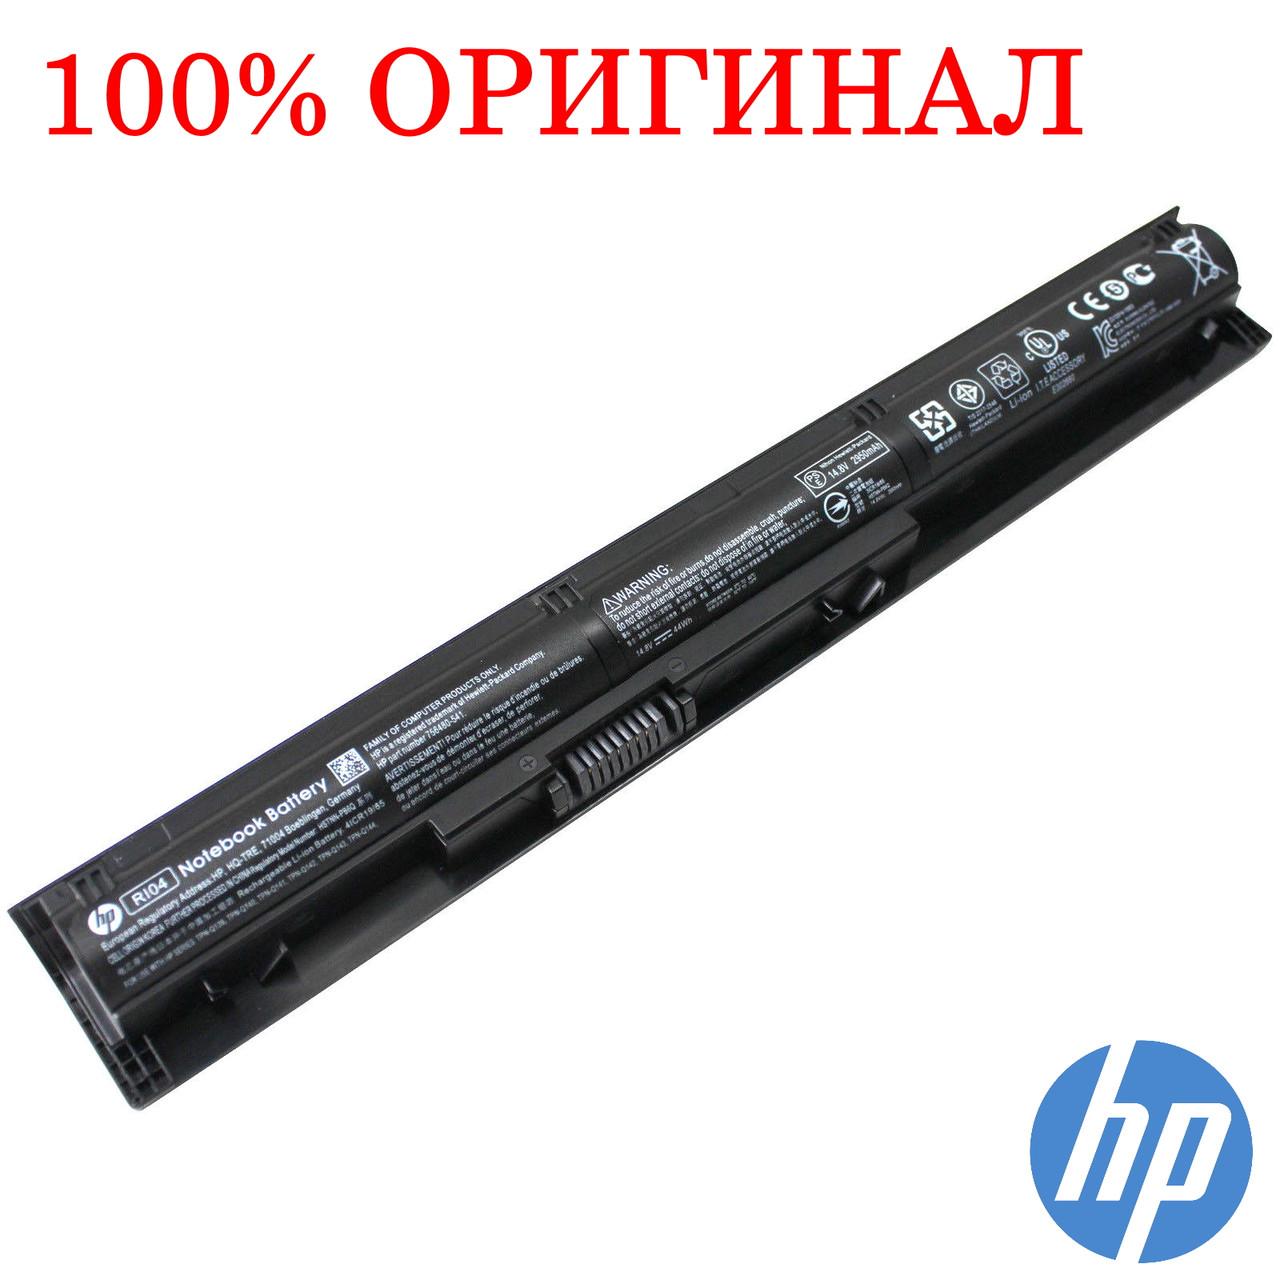 Оригинальная батарея HP HSTNN-DB7B HSTNN-PB6Q RI04 RI04XL RI06XL - Аккумулятор, АКБ